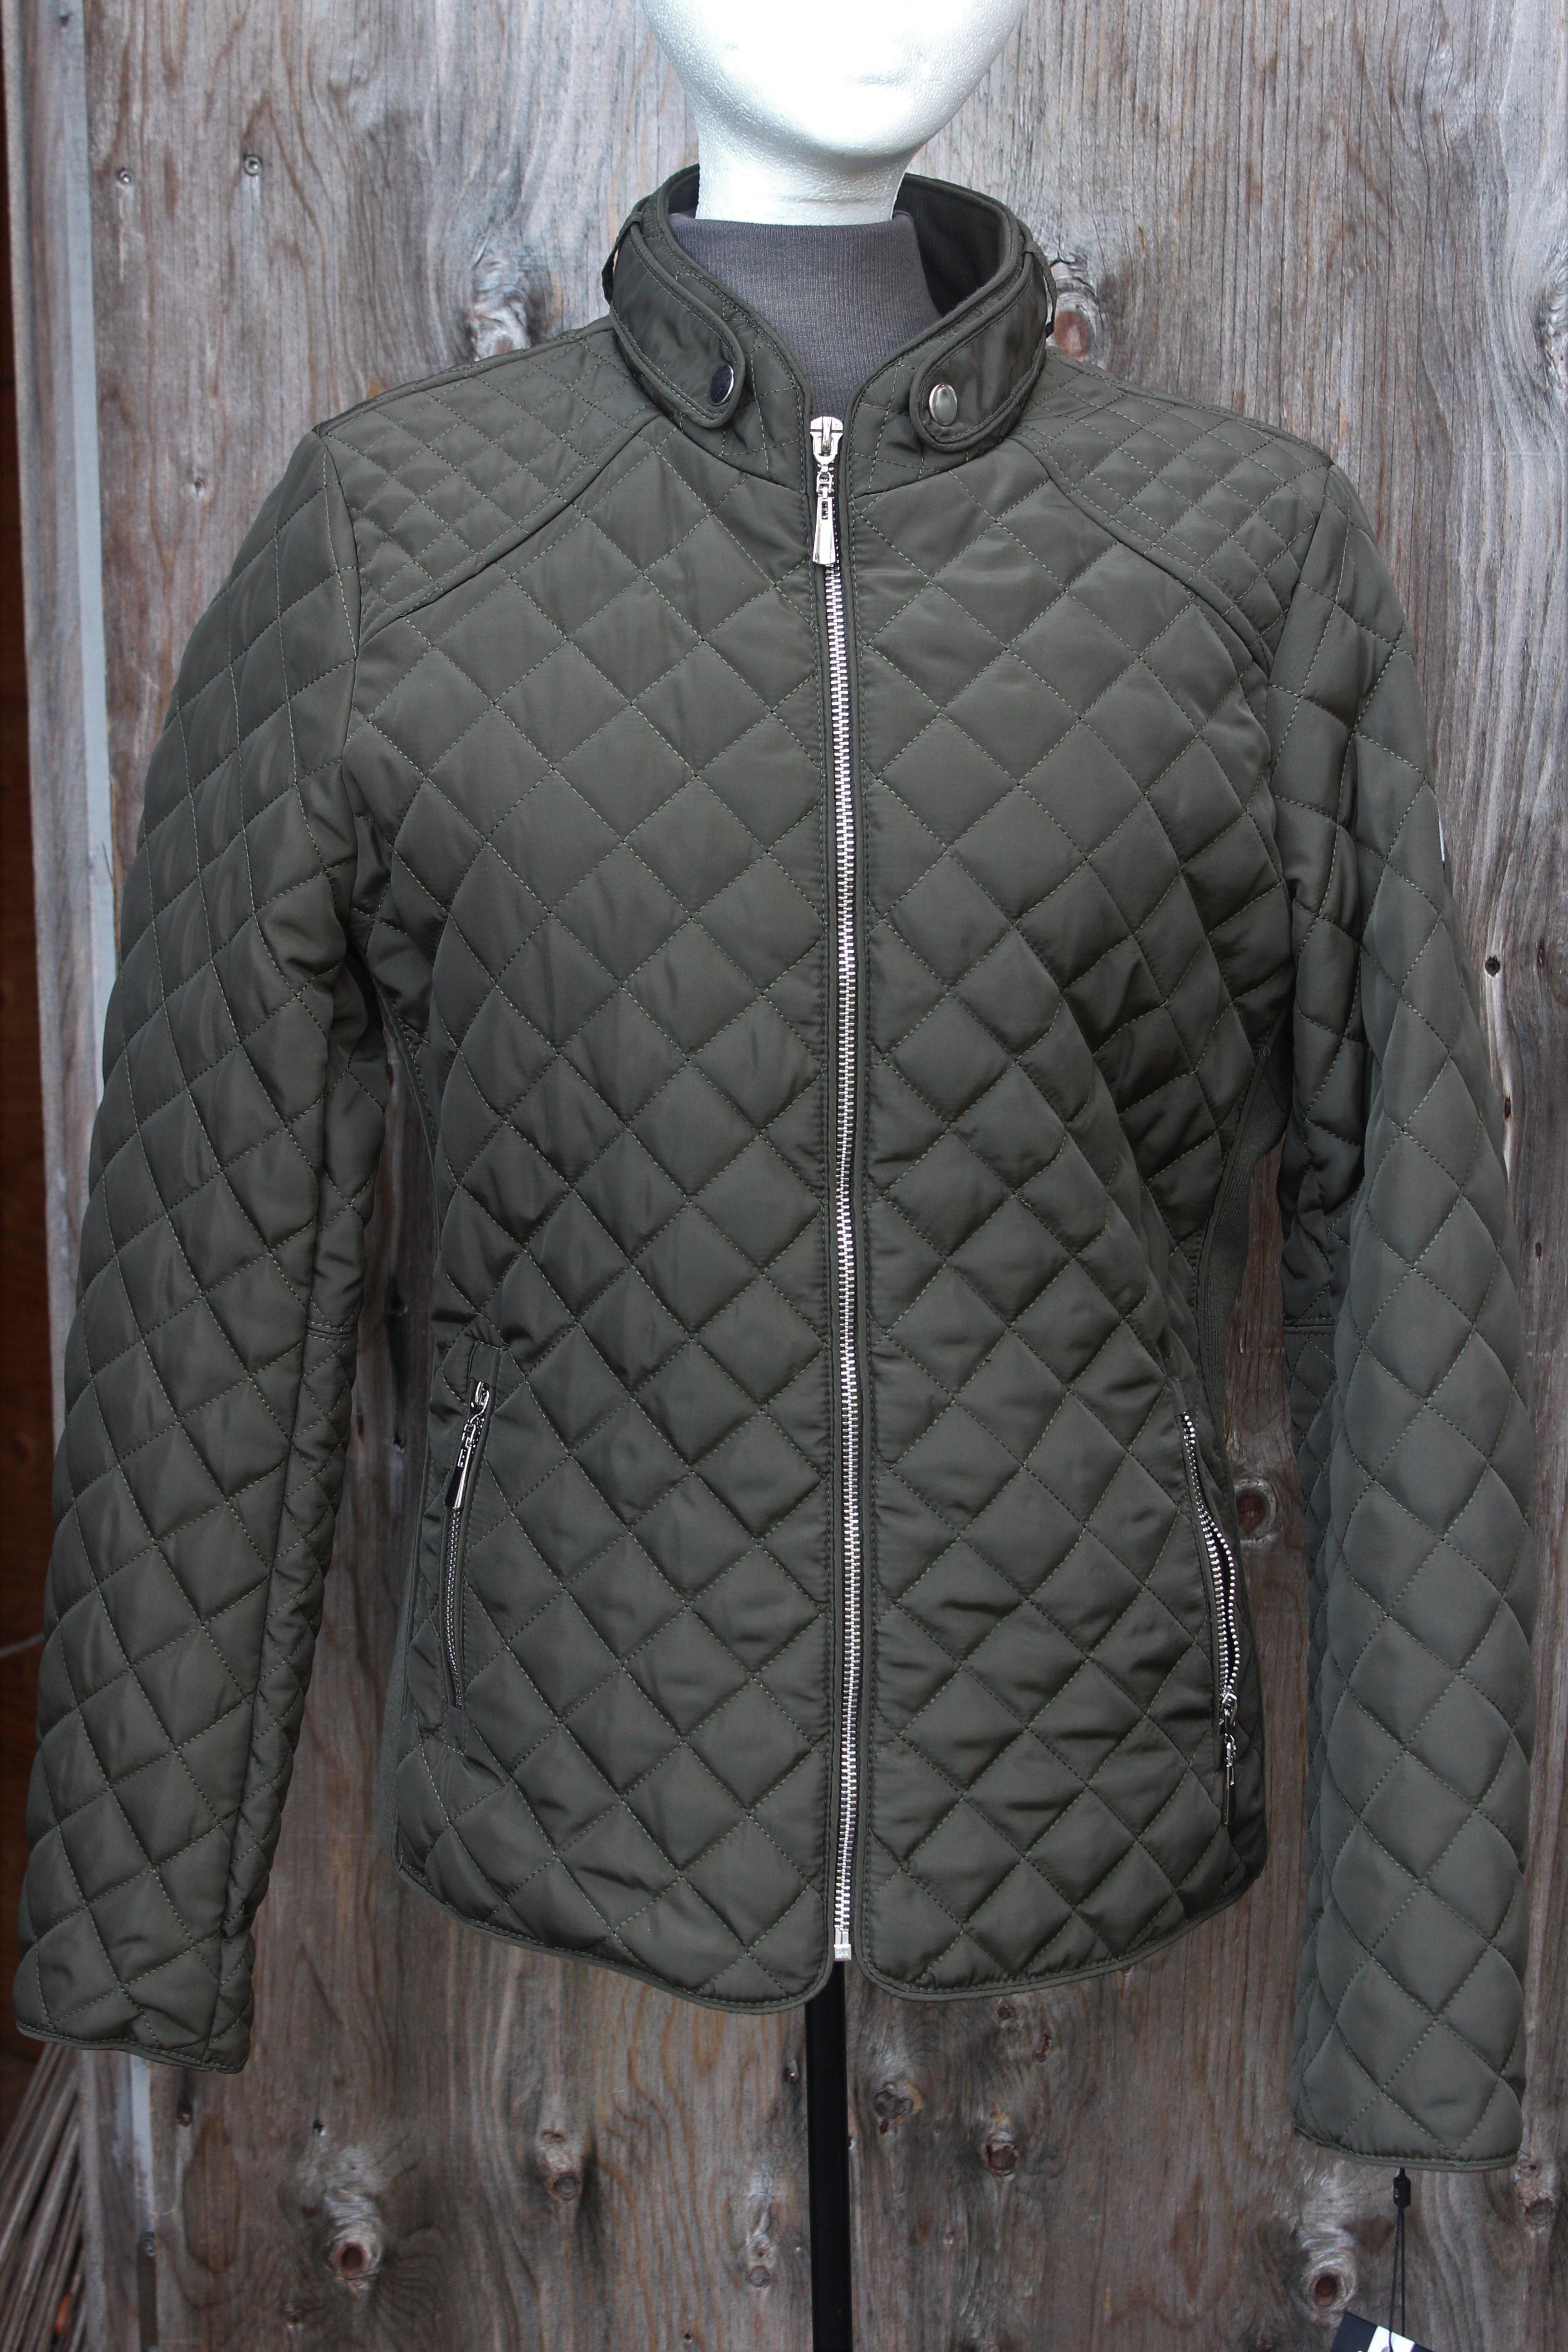 Khaki- $95.00 Plonge: Style #70505K